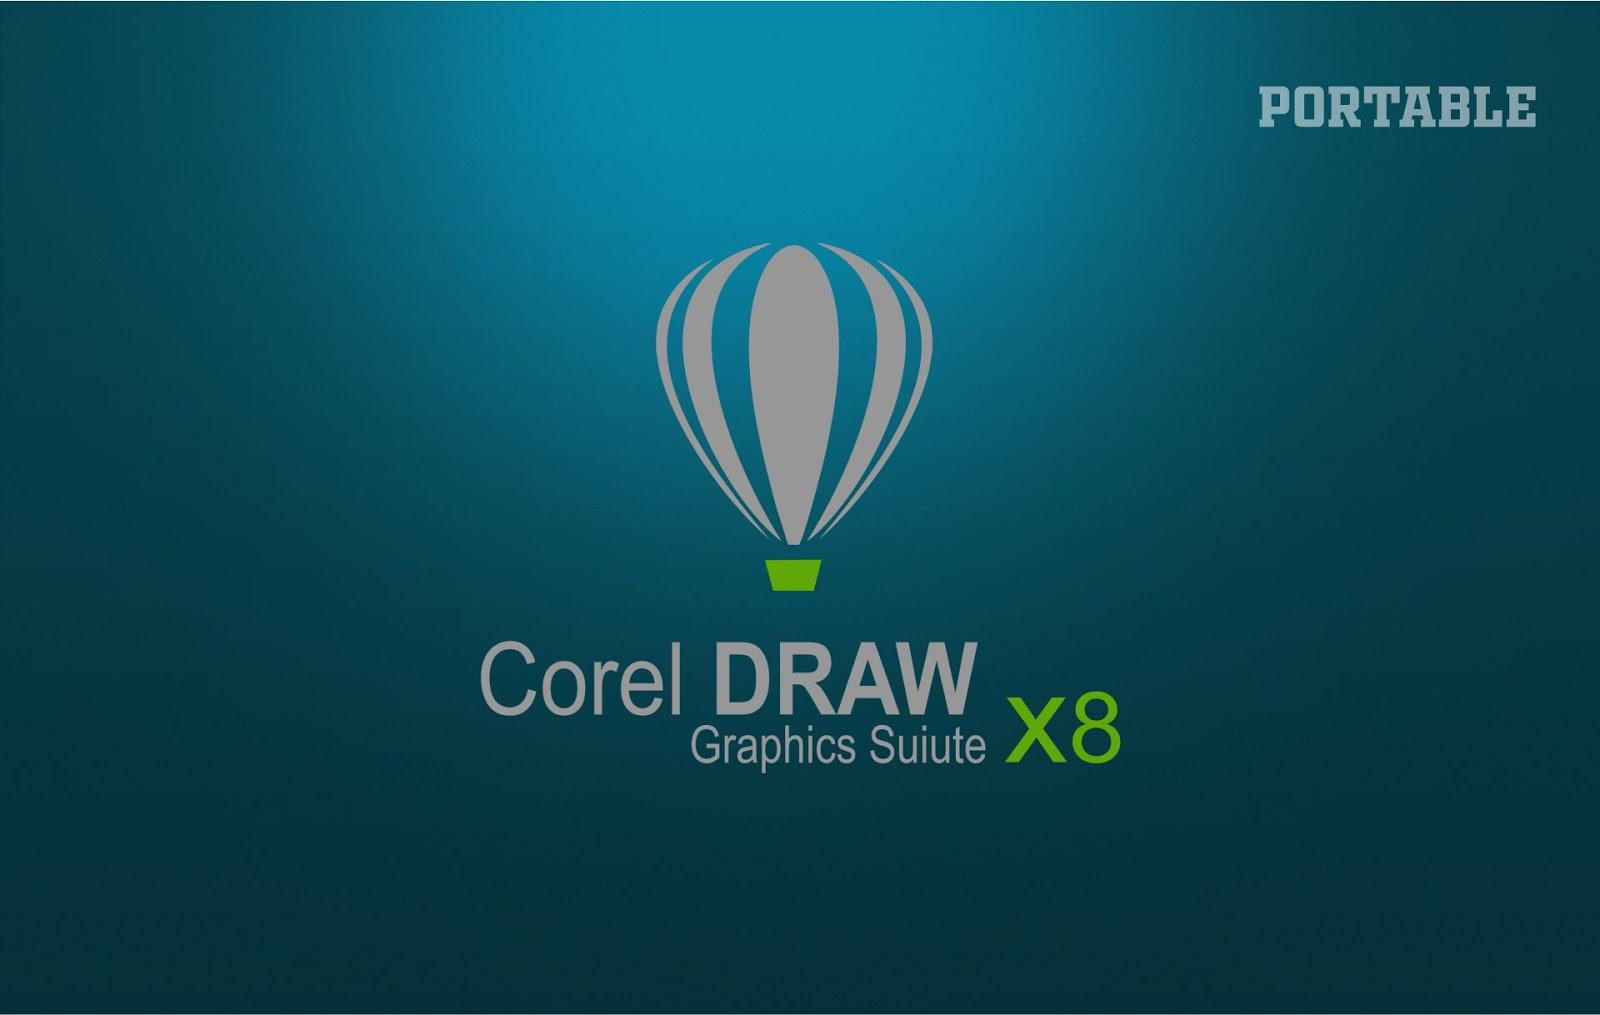 corel 8 portable gratis